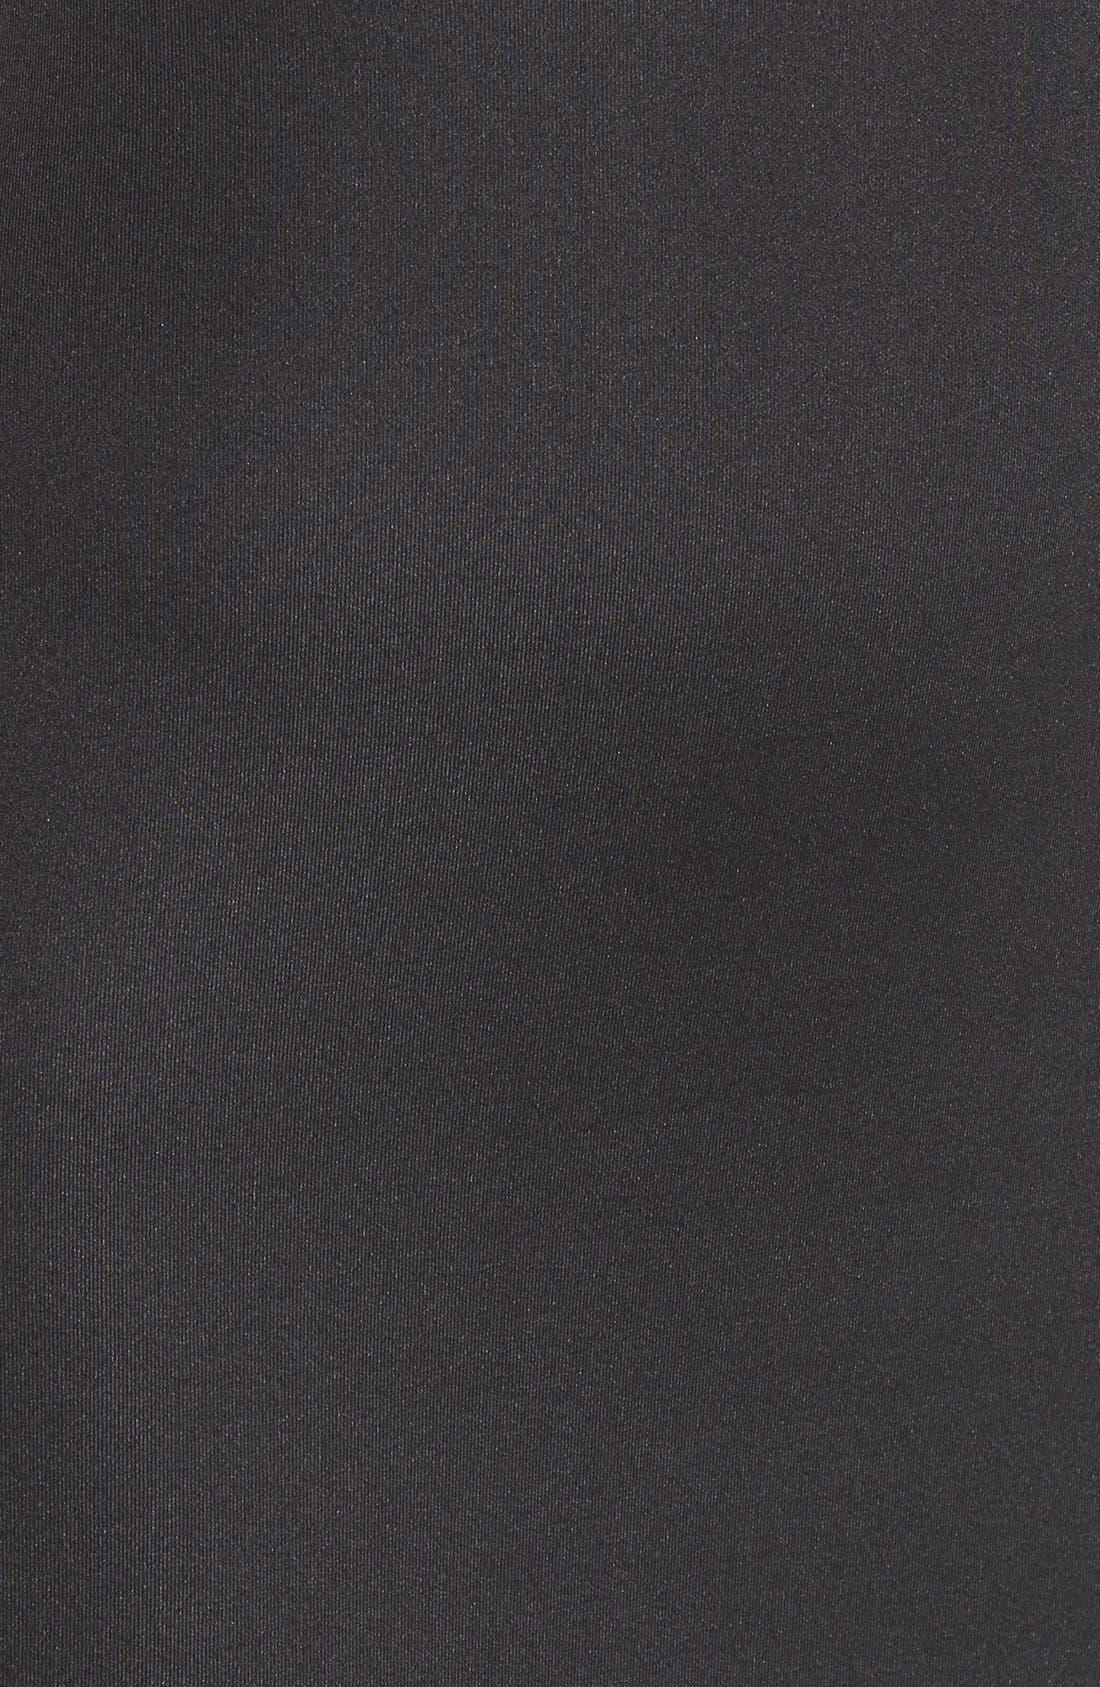 Alternate Image 5  - Soprano Scalloped Sleeveless Body-Con Dress